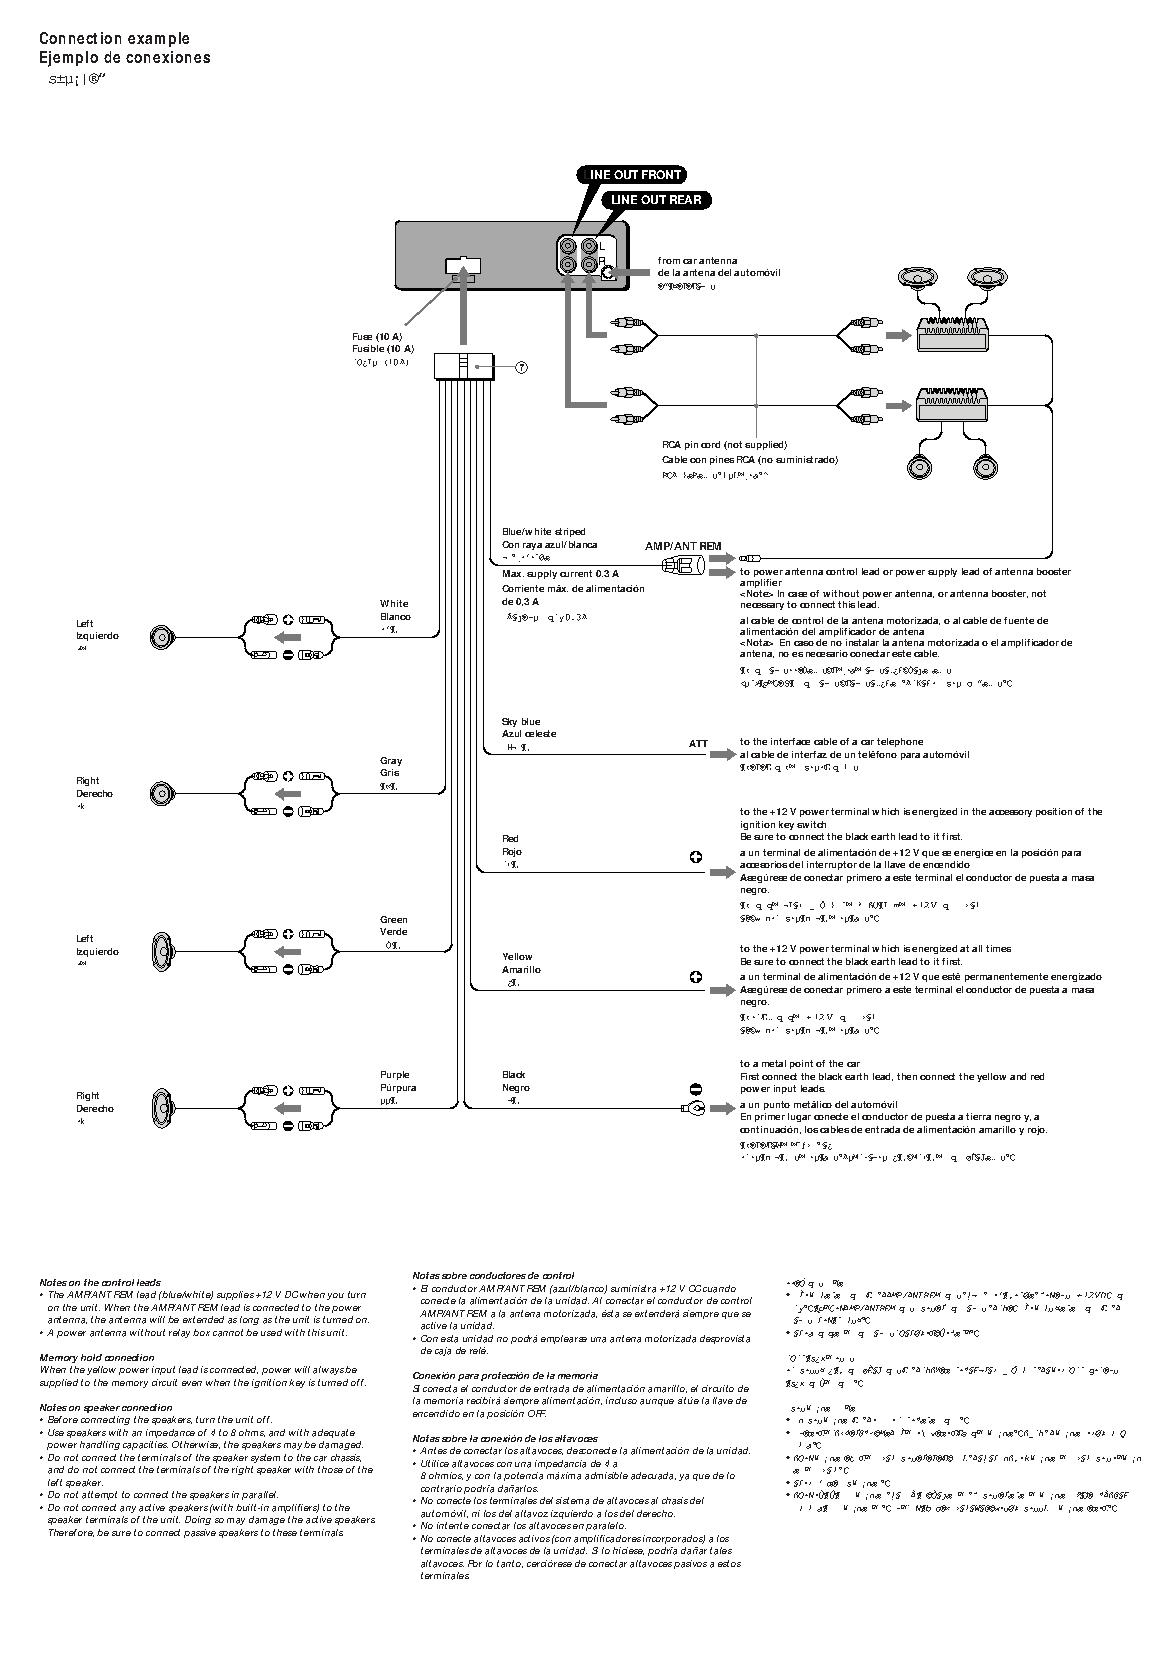 Sony Cdx Gt330 Wiring Diagram Fresh Sony Cdx L550X Wiring Diagram - Sony Cdx Gt565Up Wiring Diagram